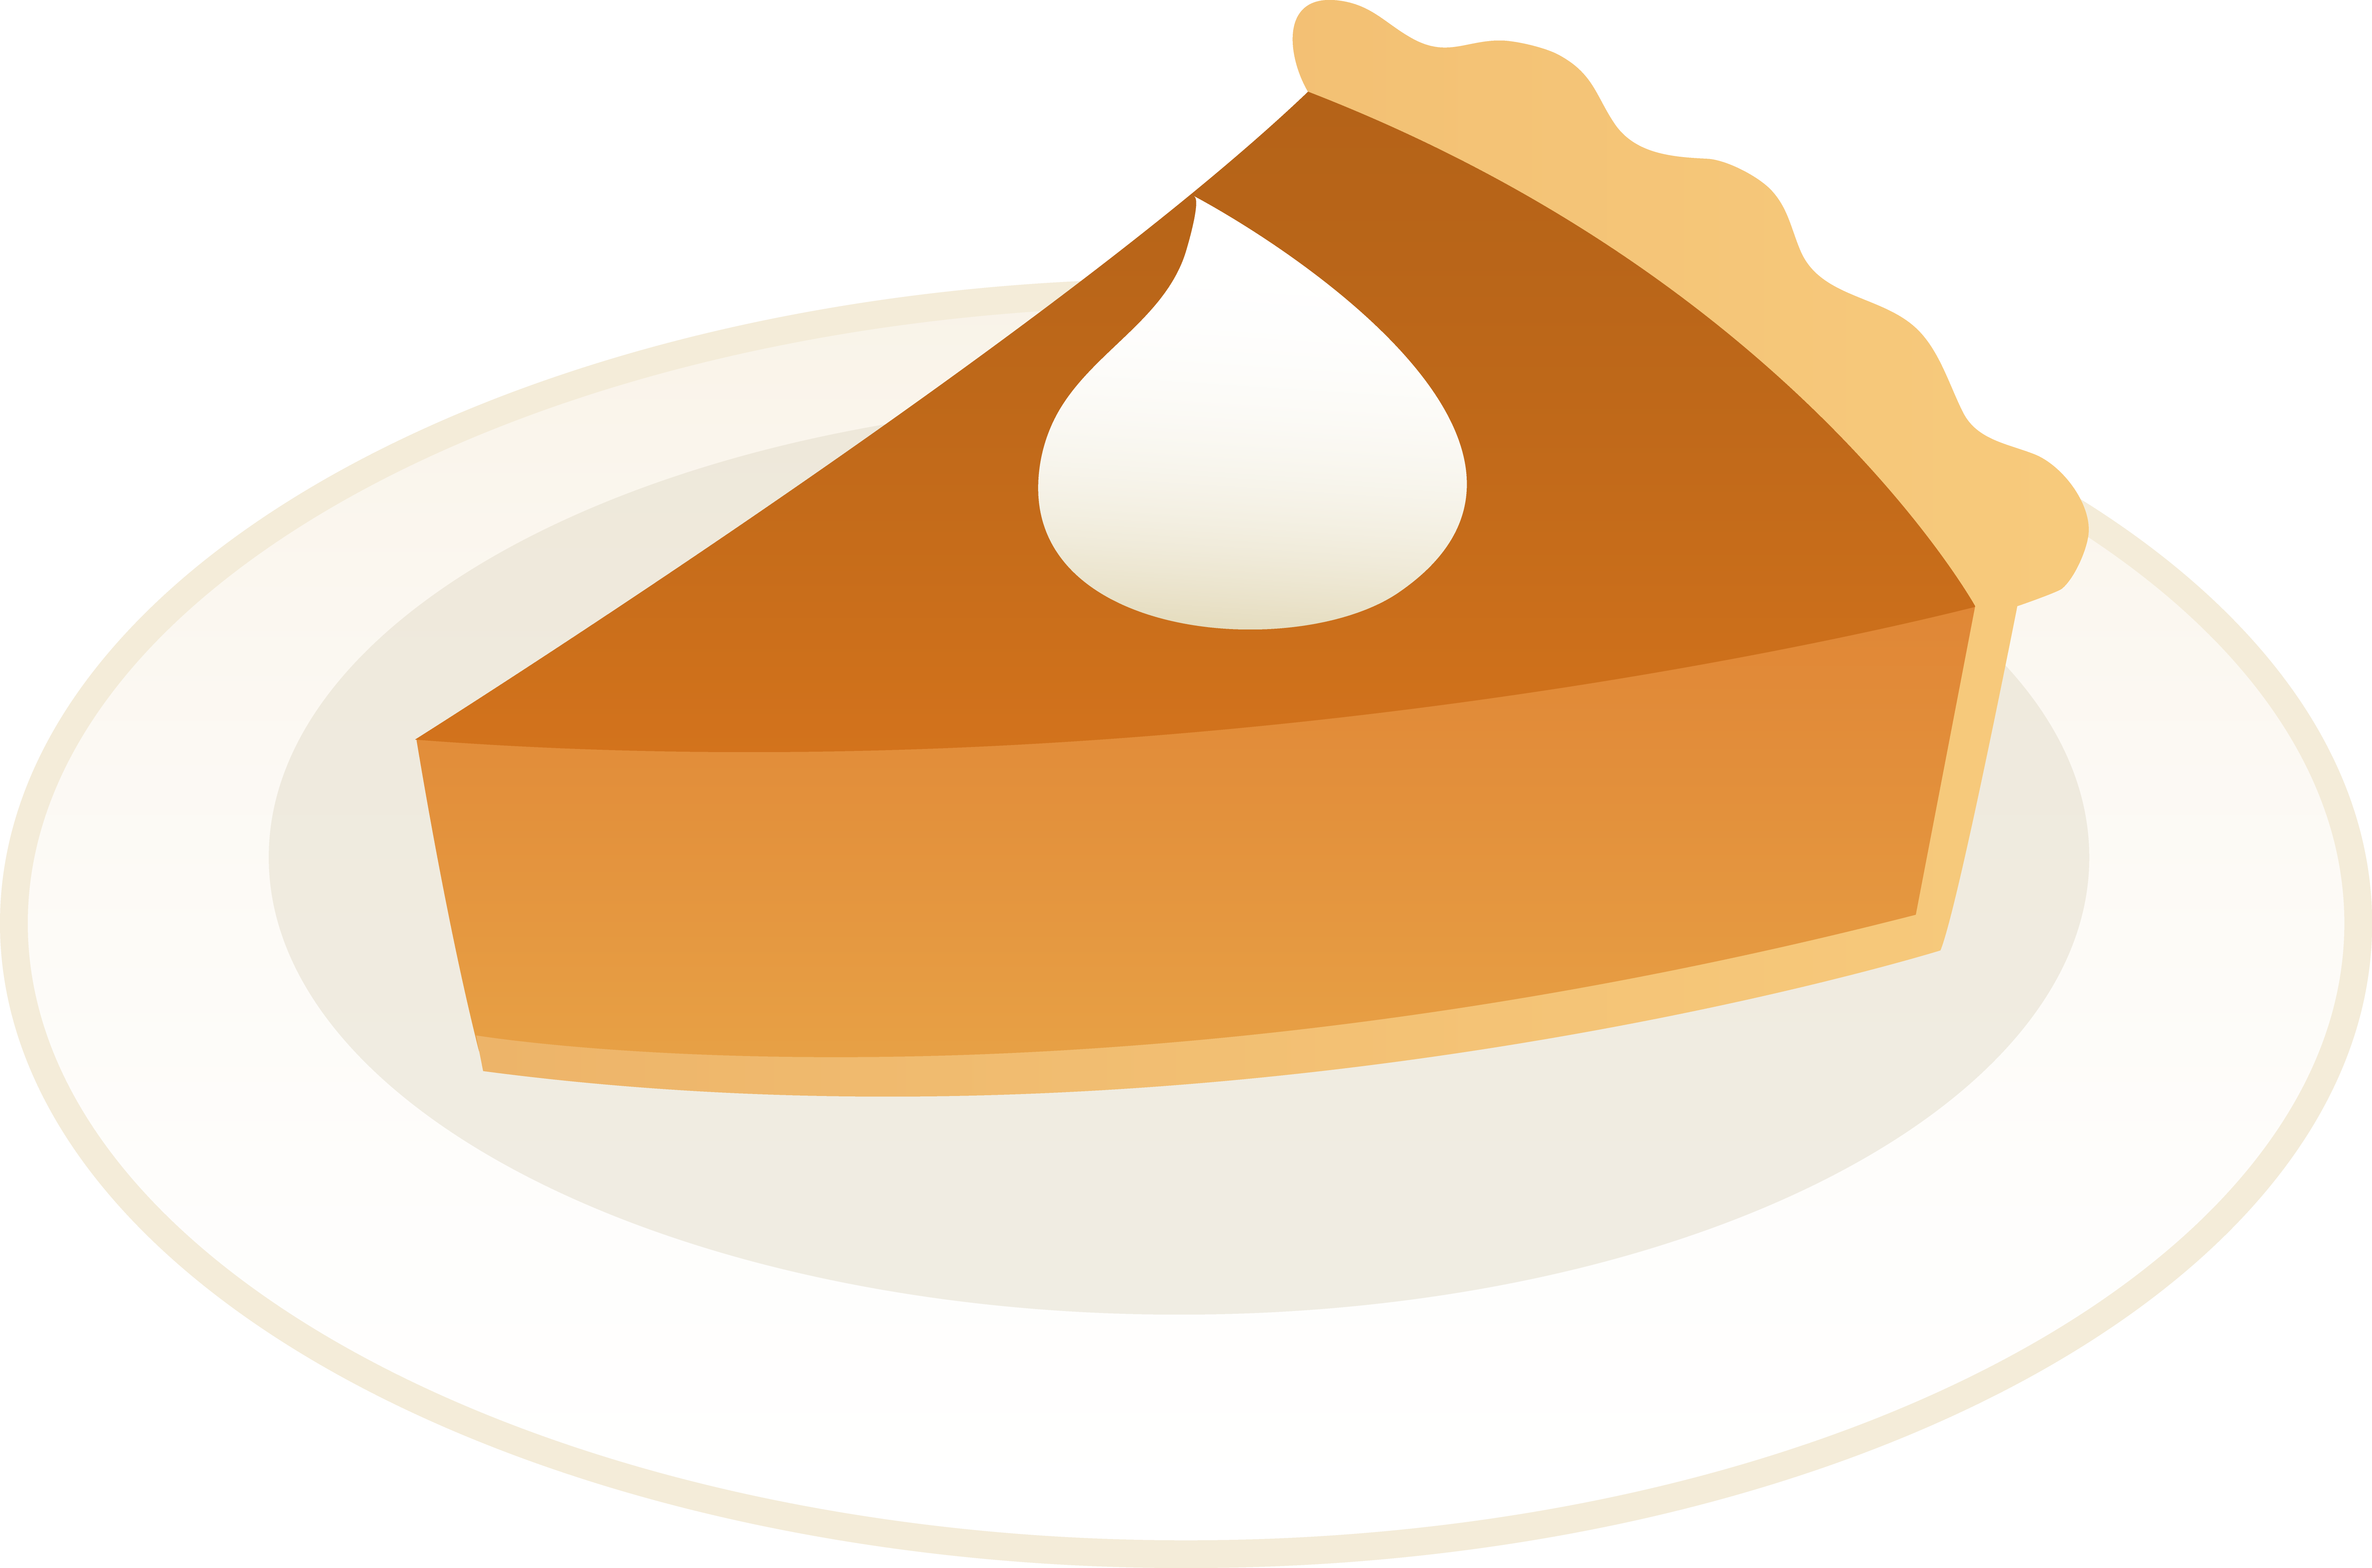 collection of free. Pie clipart pumpkin pie